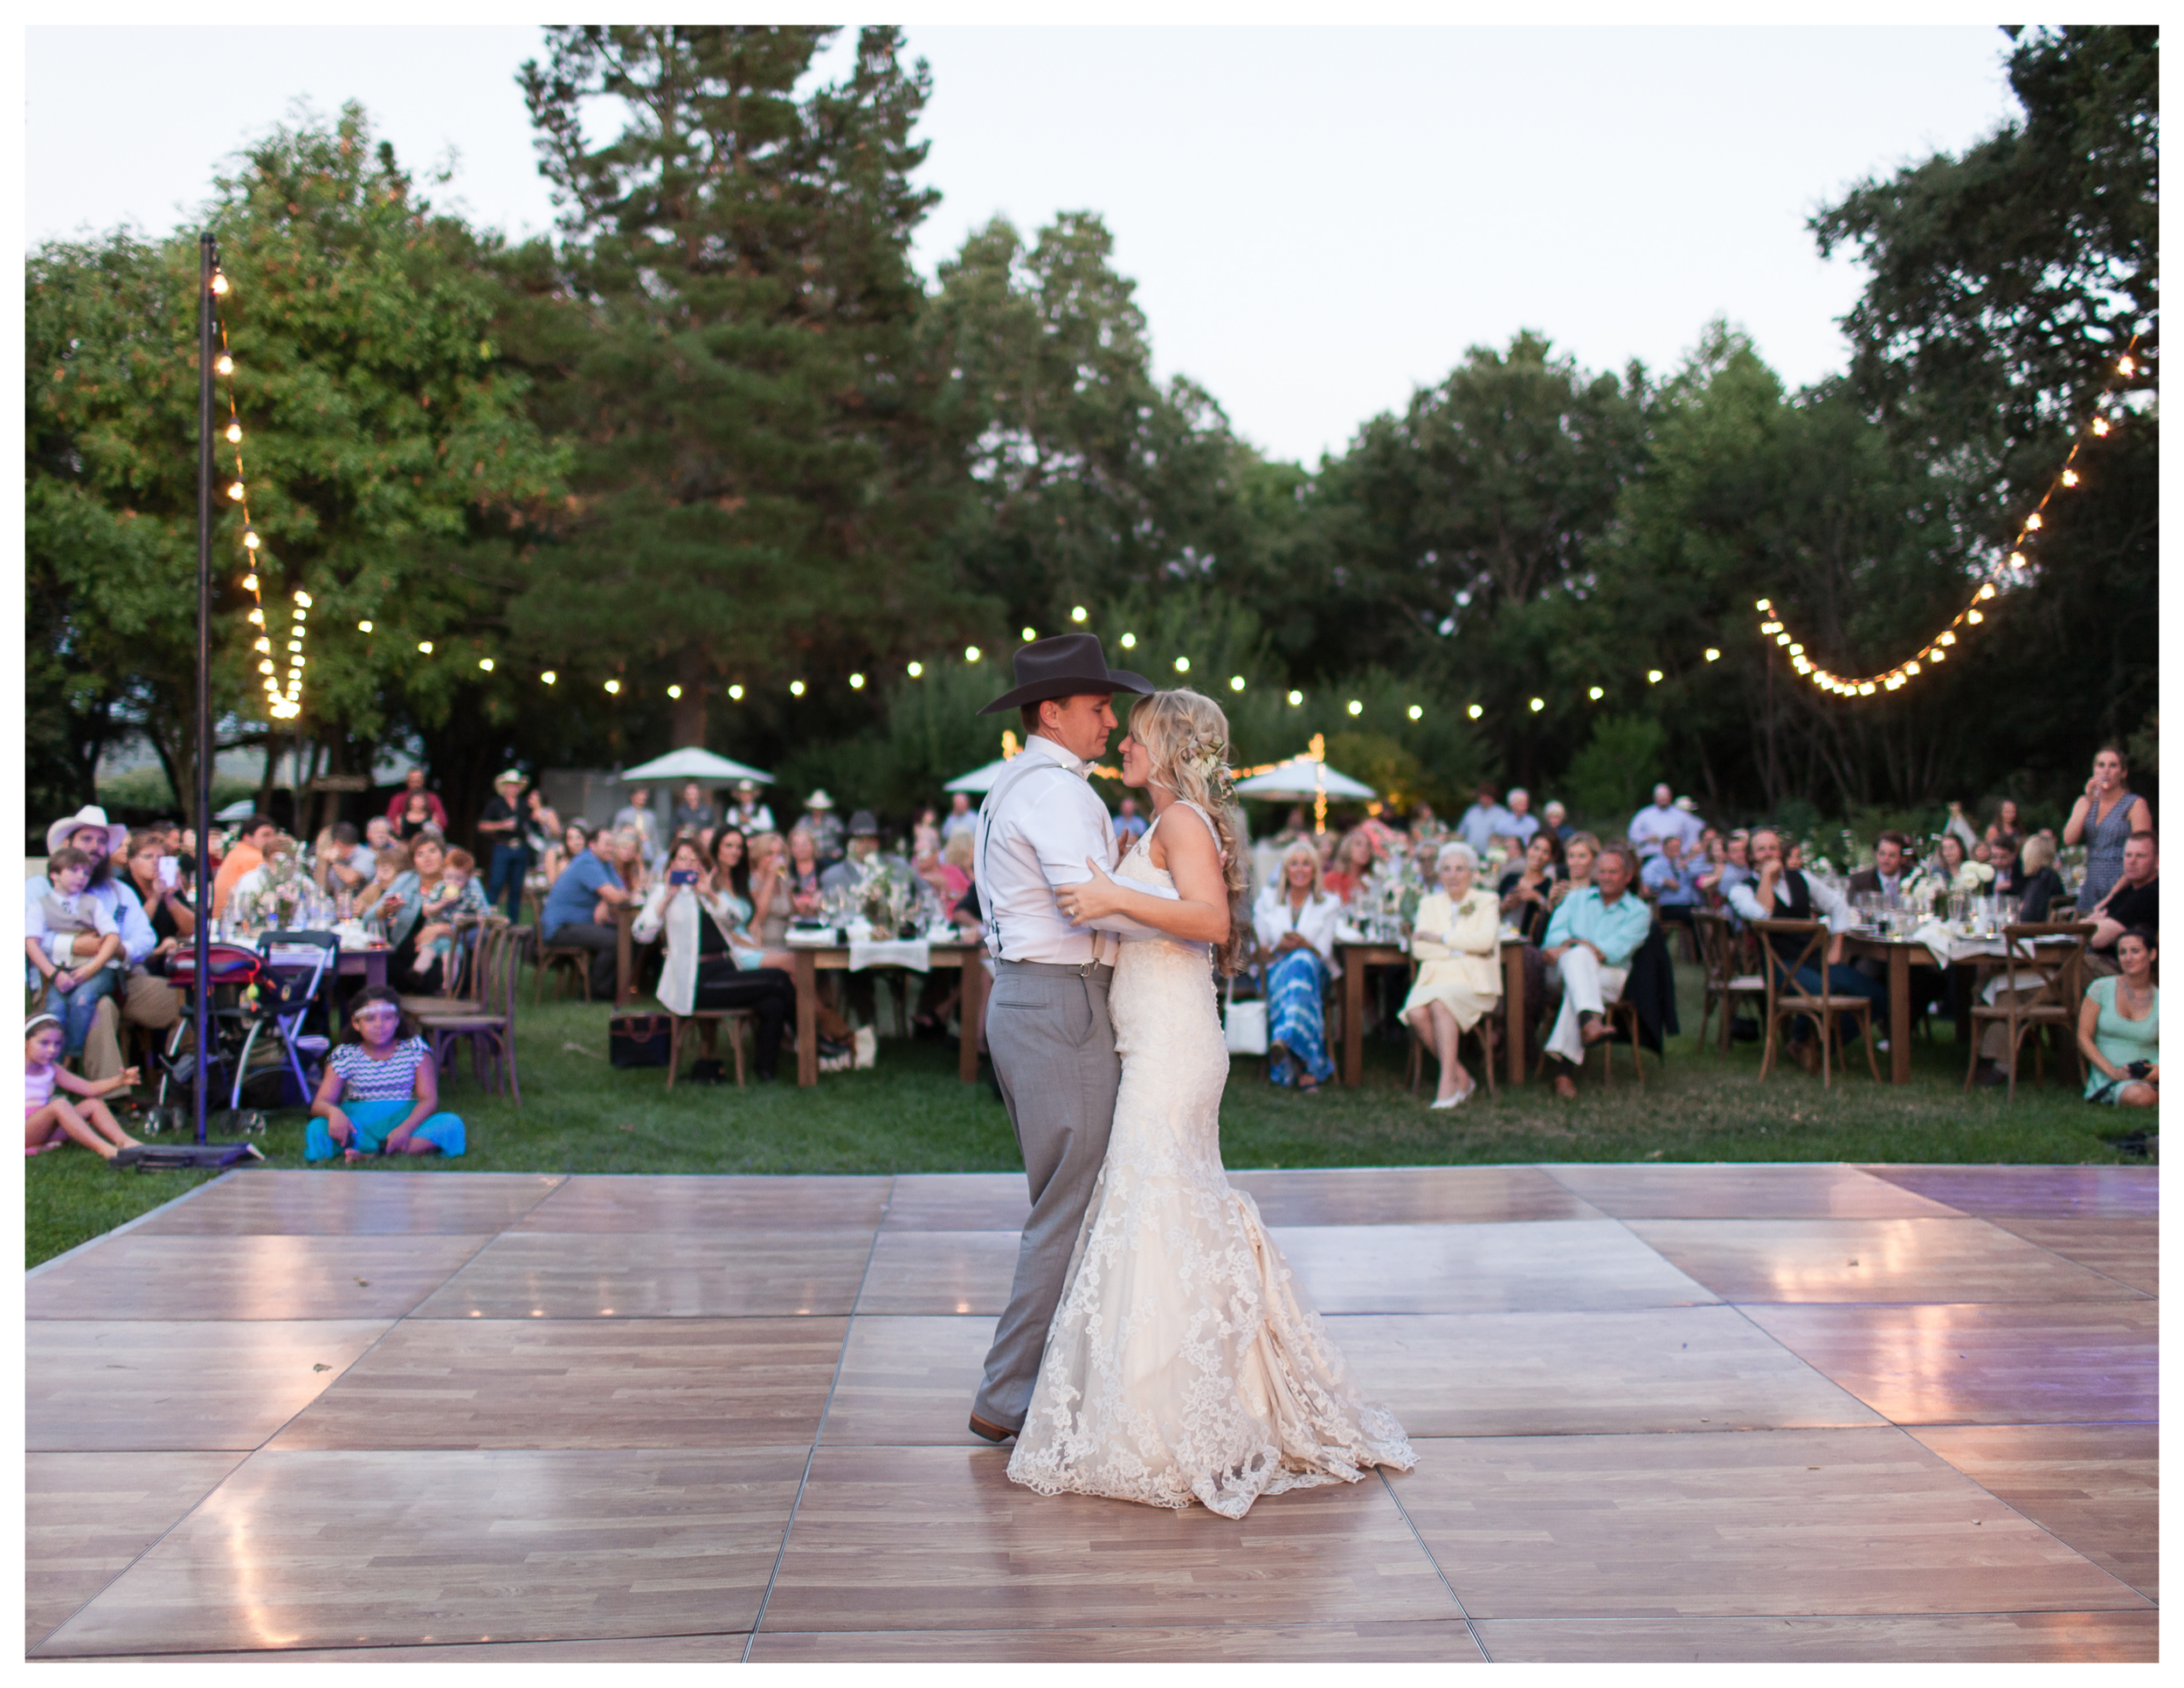 sonoma ranch wedding 12.jpg